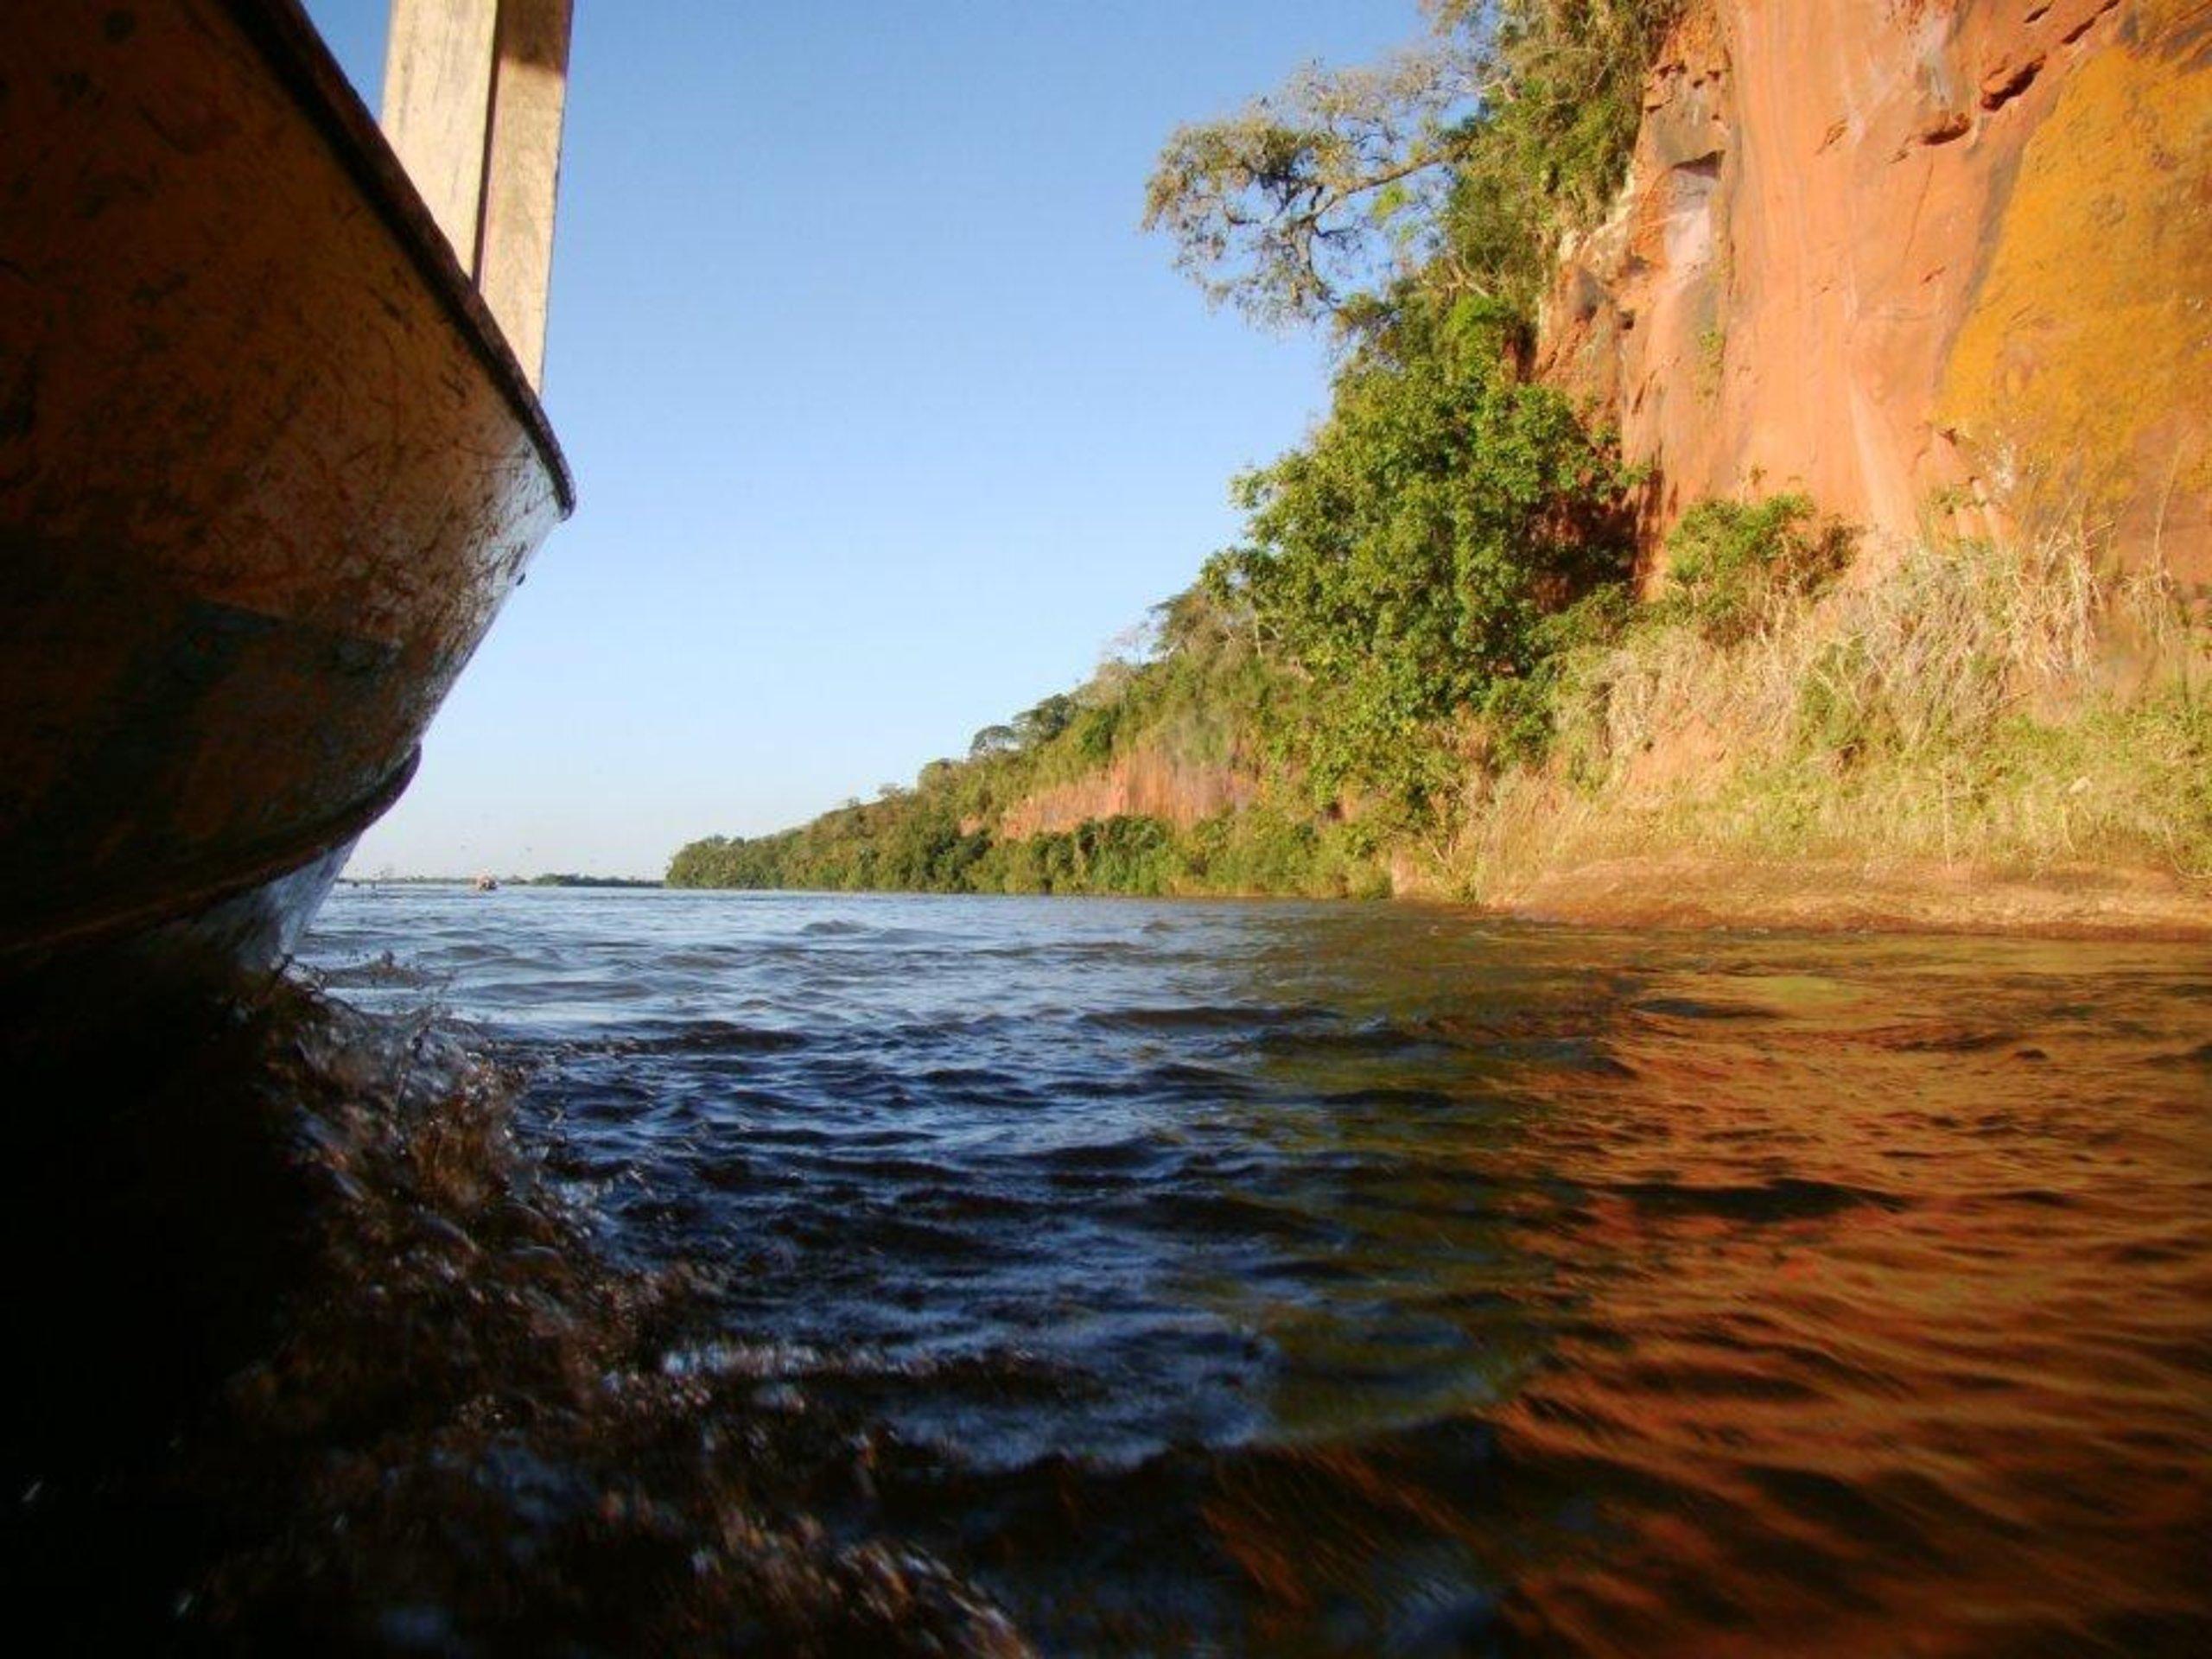 Icaraíma Paraná fonte: media-cdn.tripadvisor.com